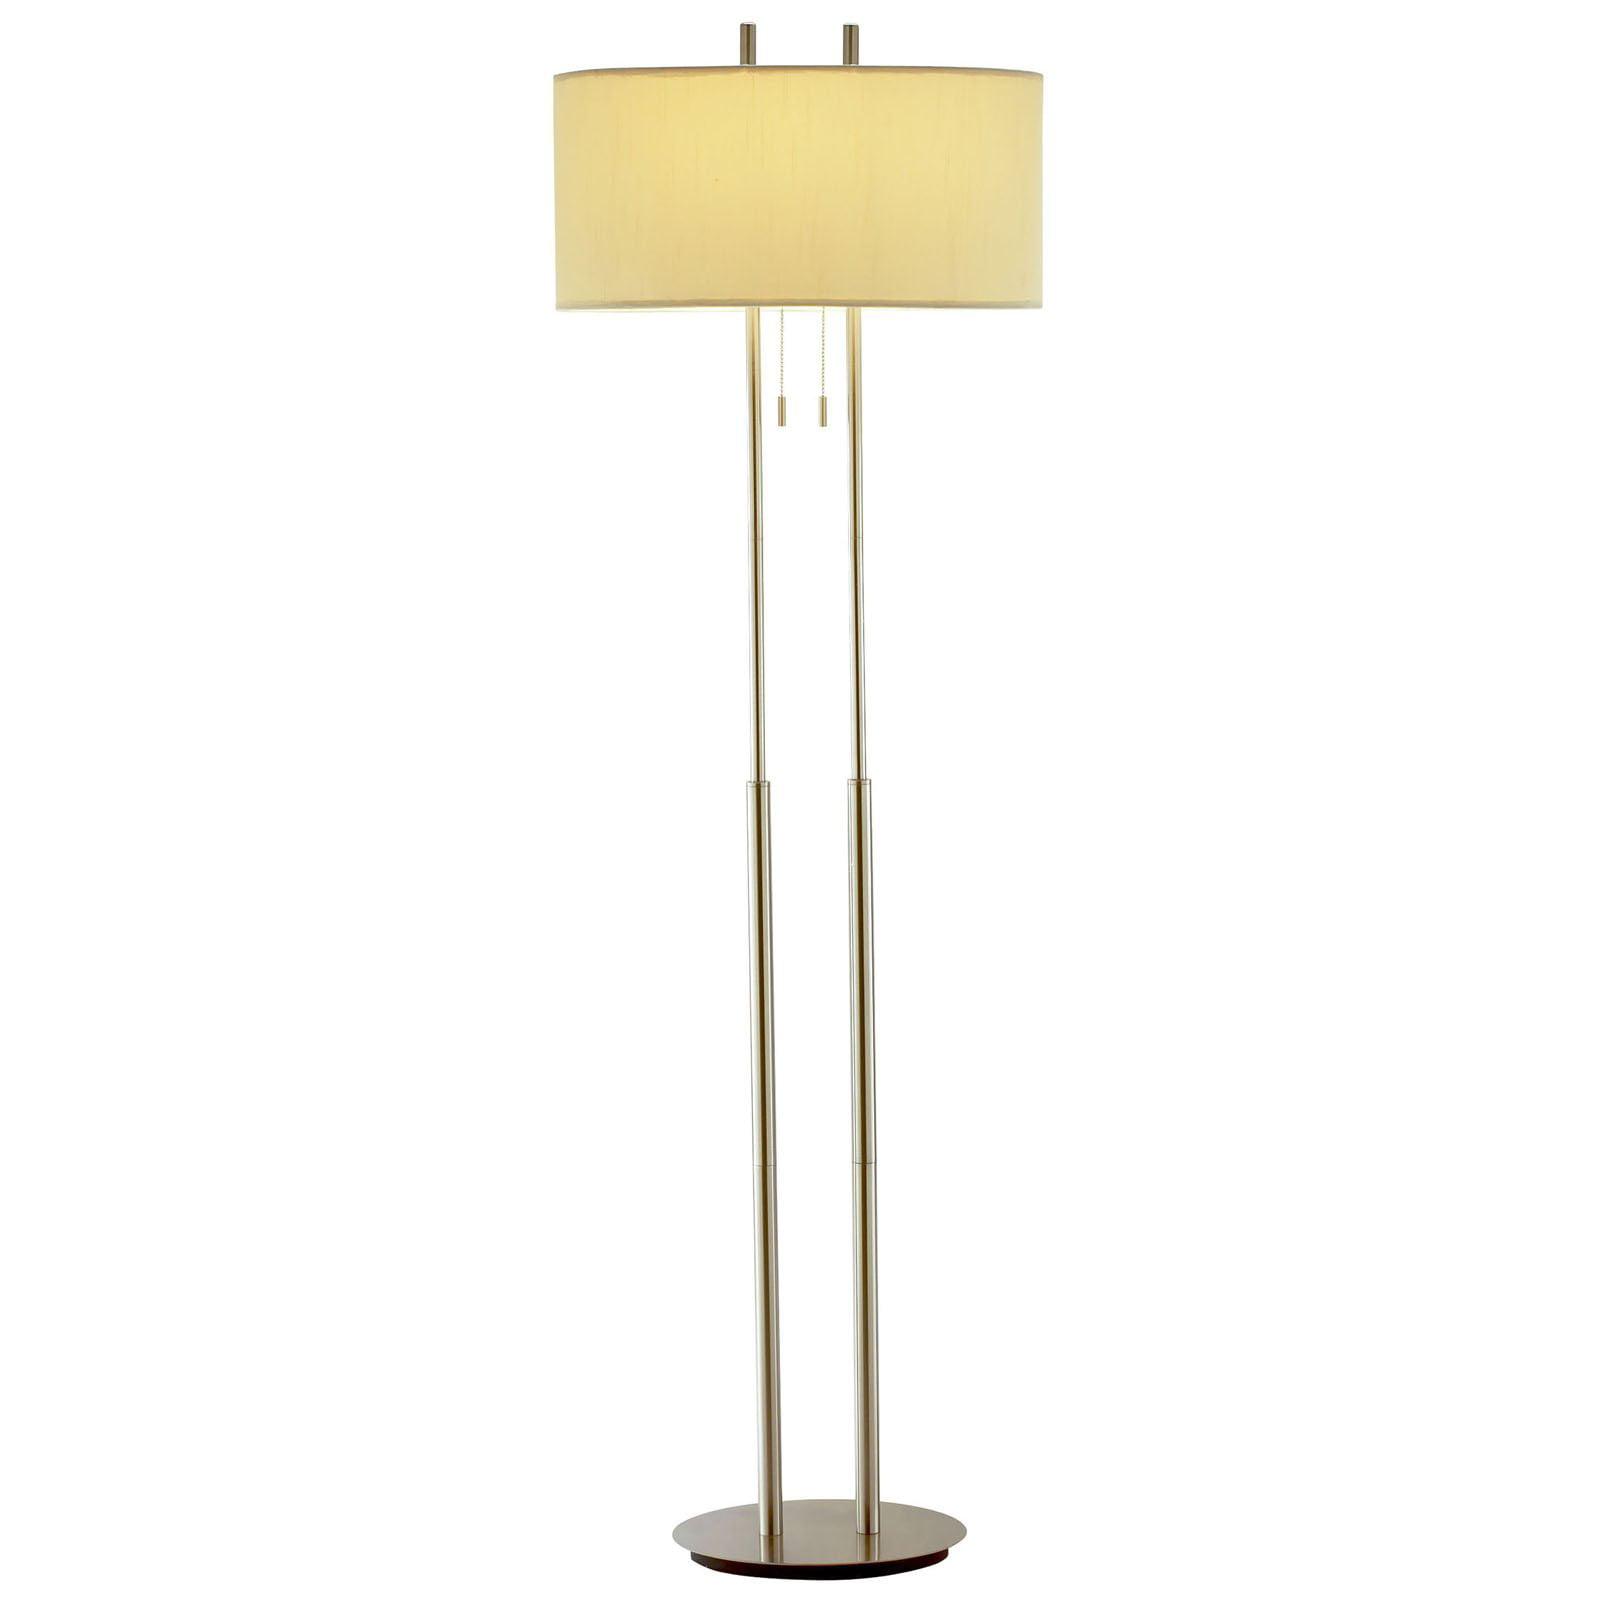 Adesso 4016 Duet Floor Lamp